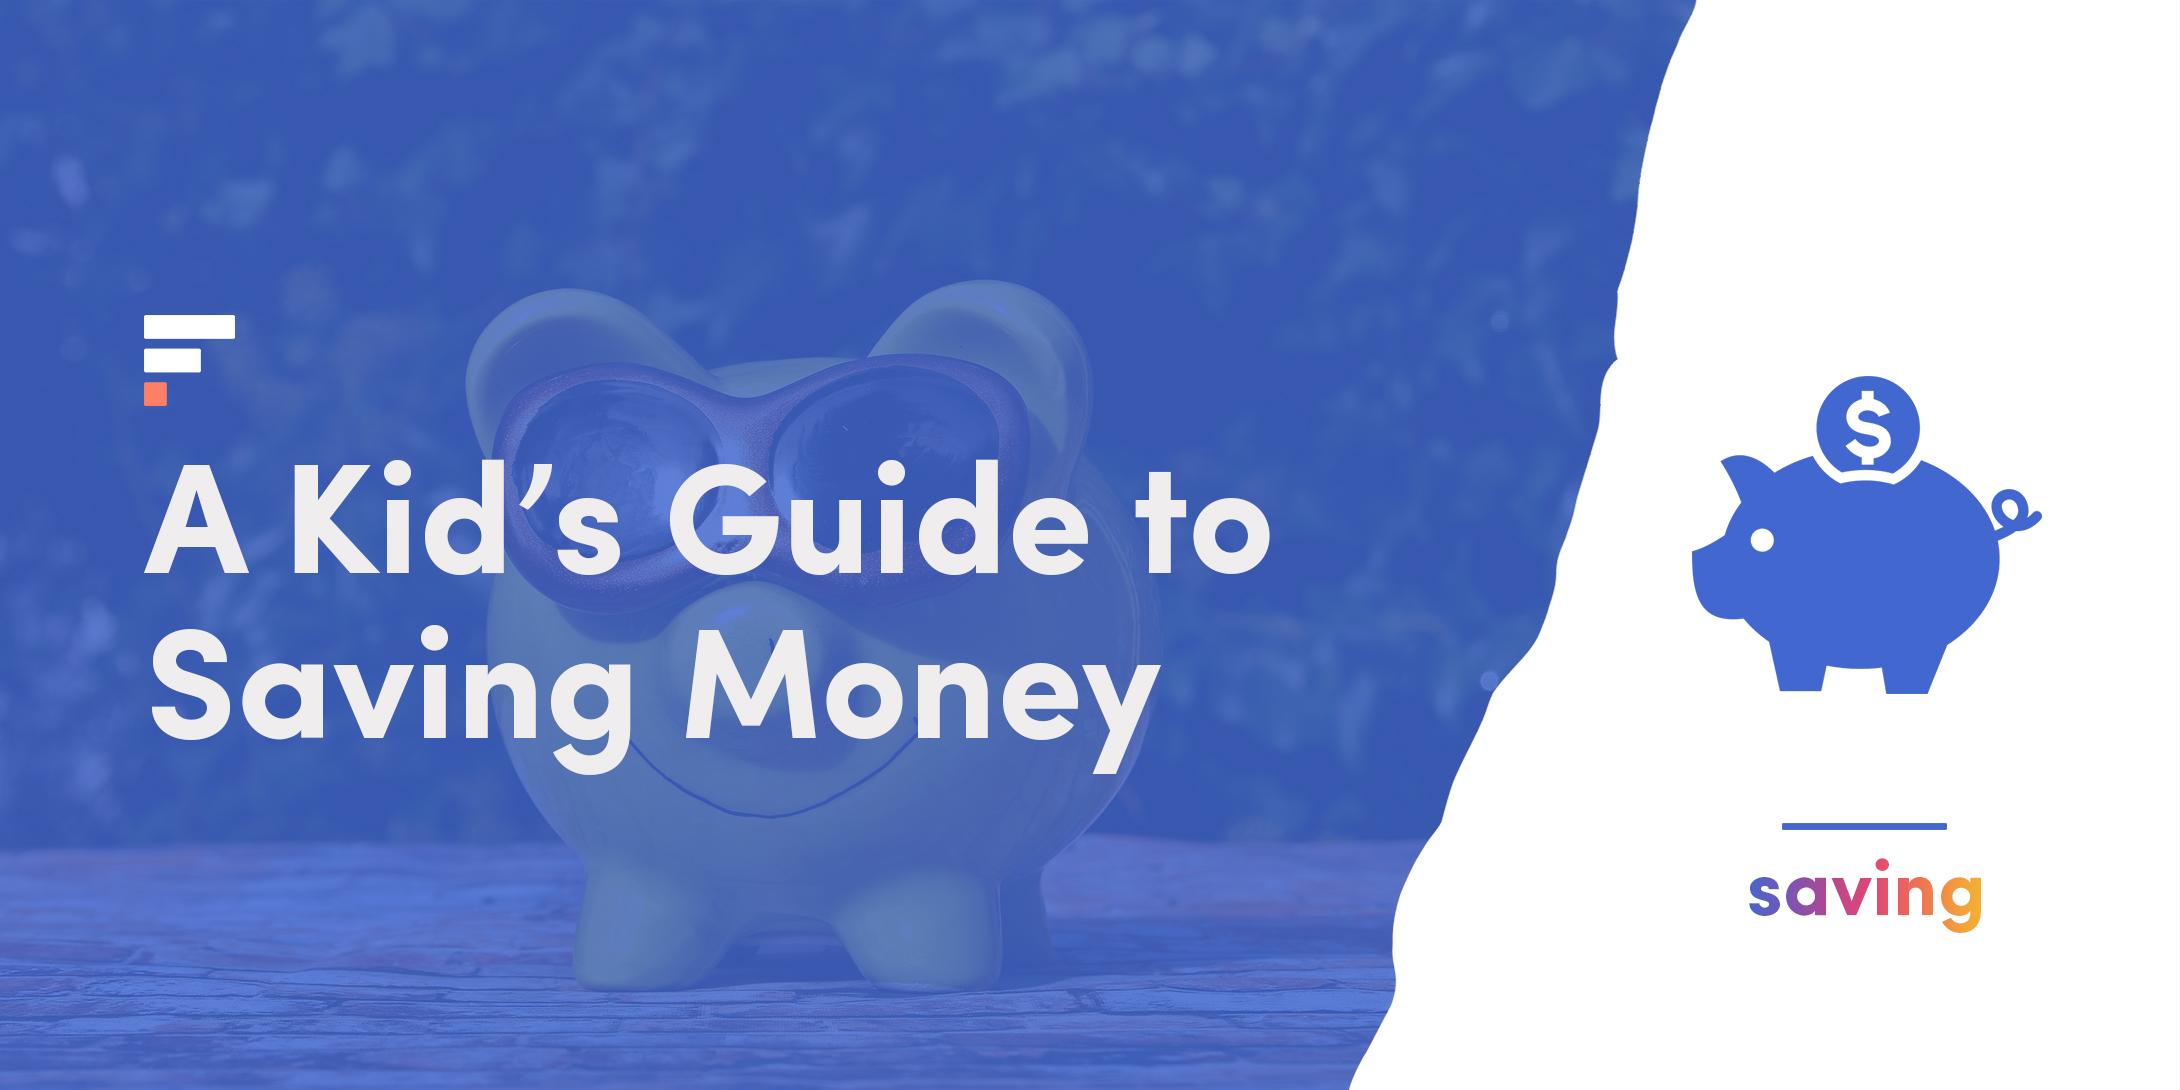 Kids guide to saving money